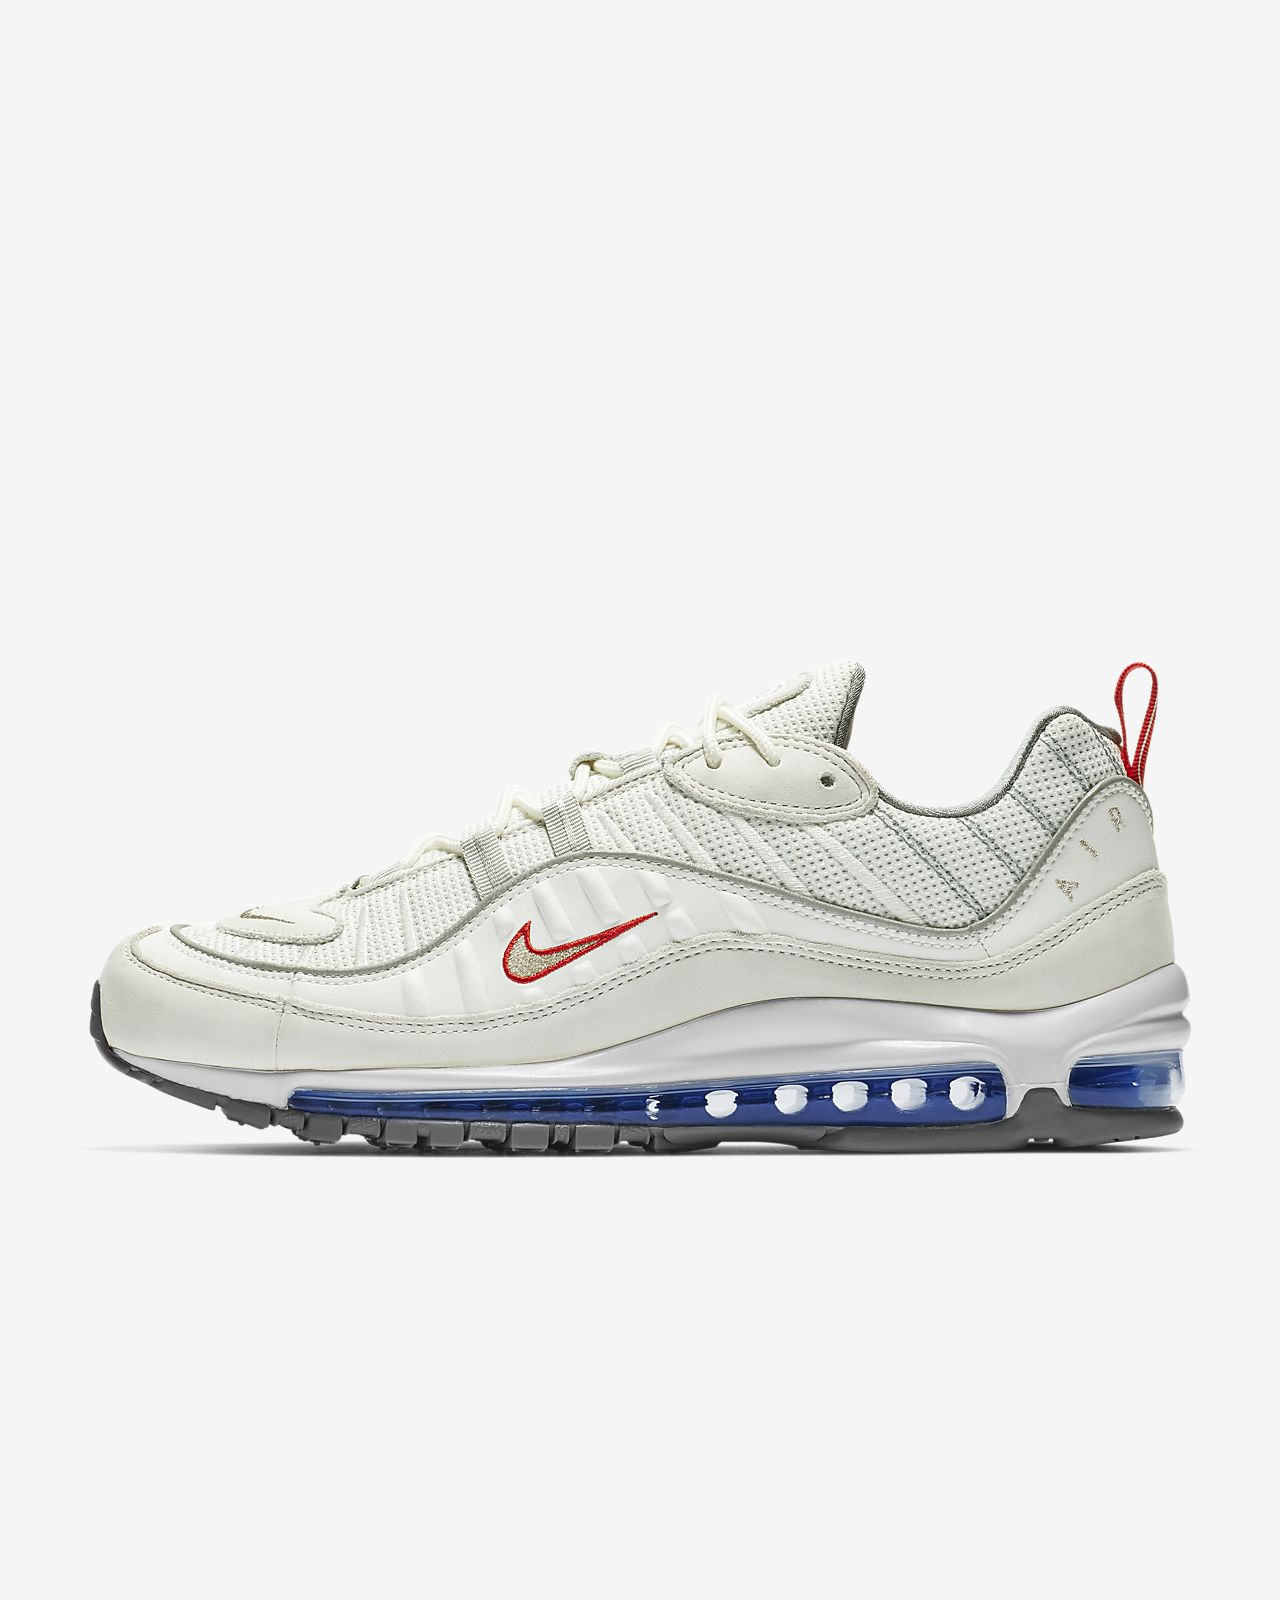 a6b06627f7 Nike Air Max 98 Men's Shoe. Nike.com ZA